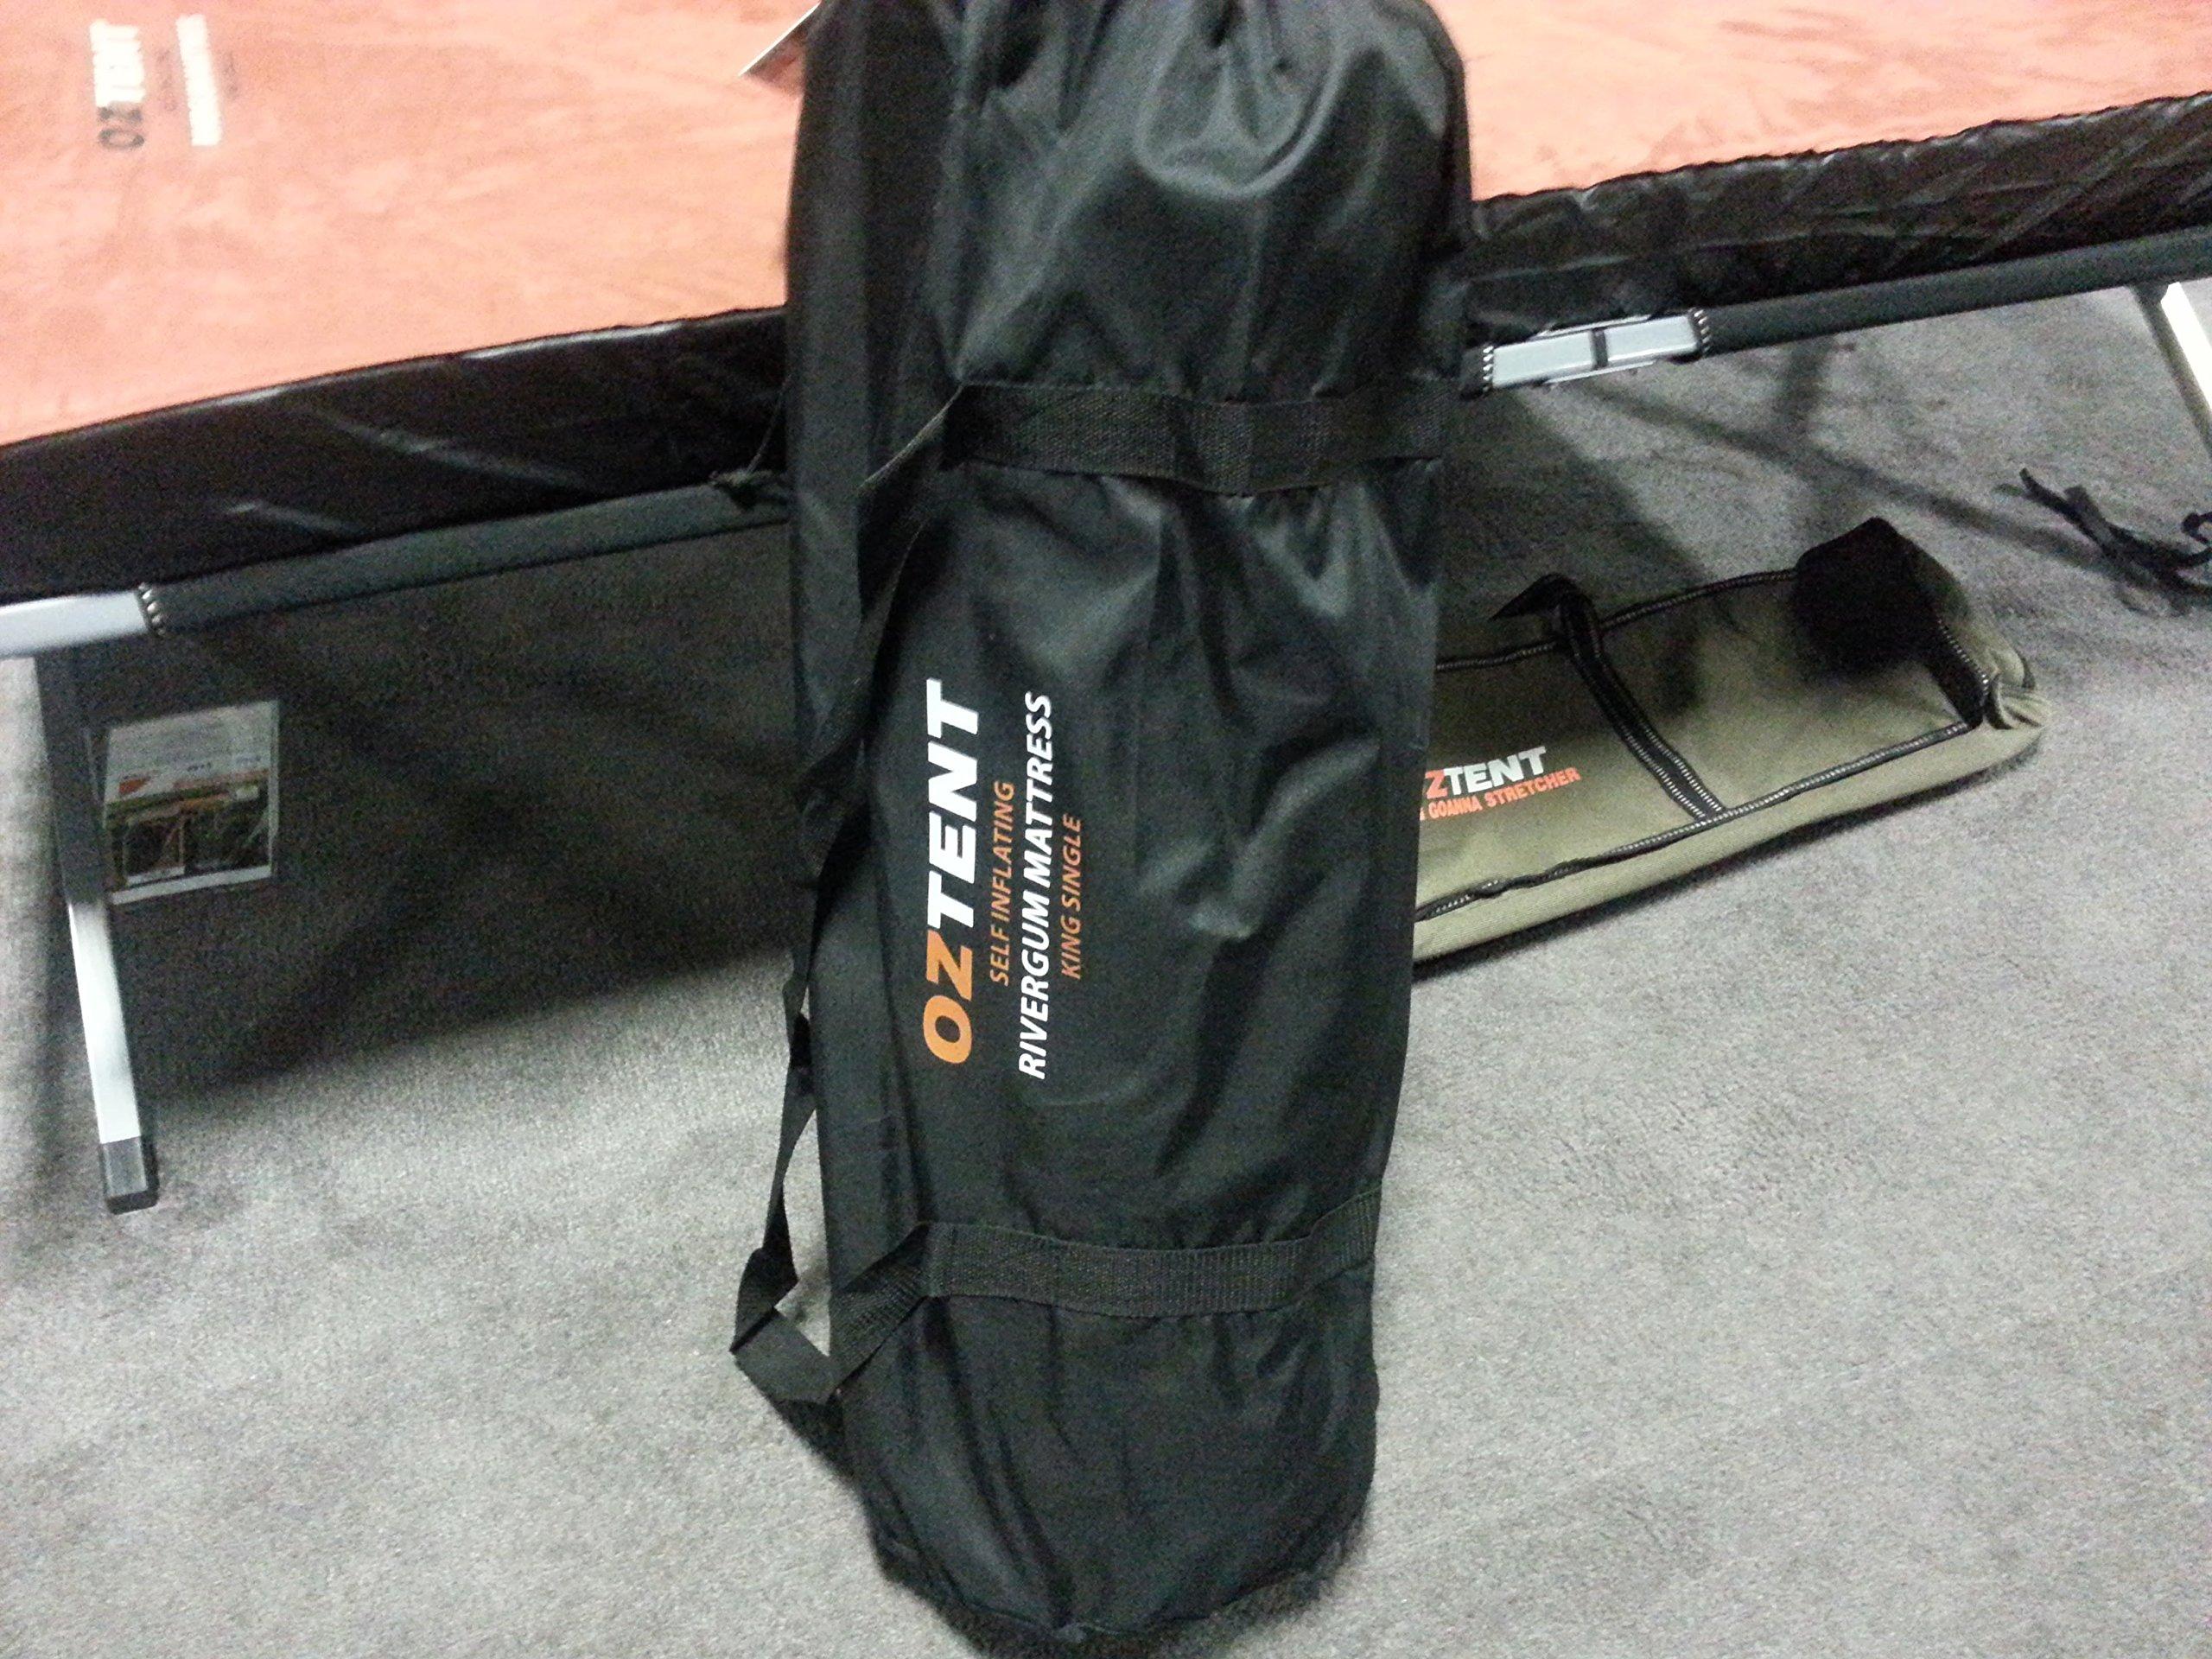 OzTent Rivergum Self Inflating Camping Air Mattress